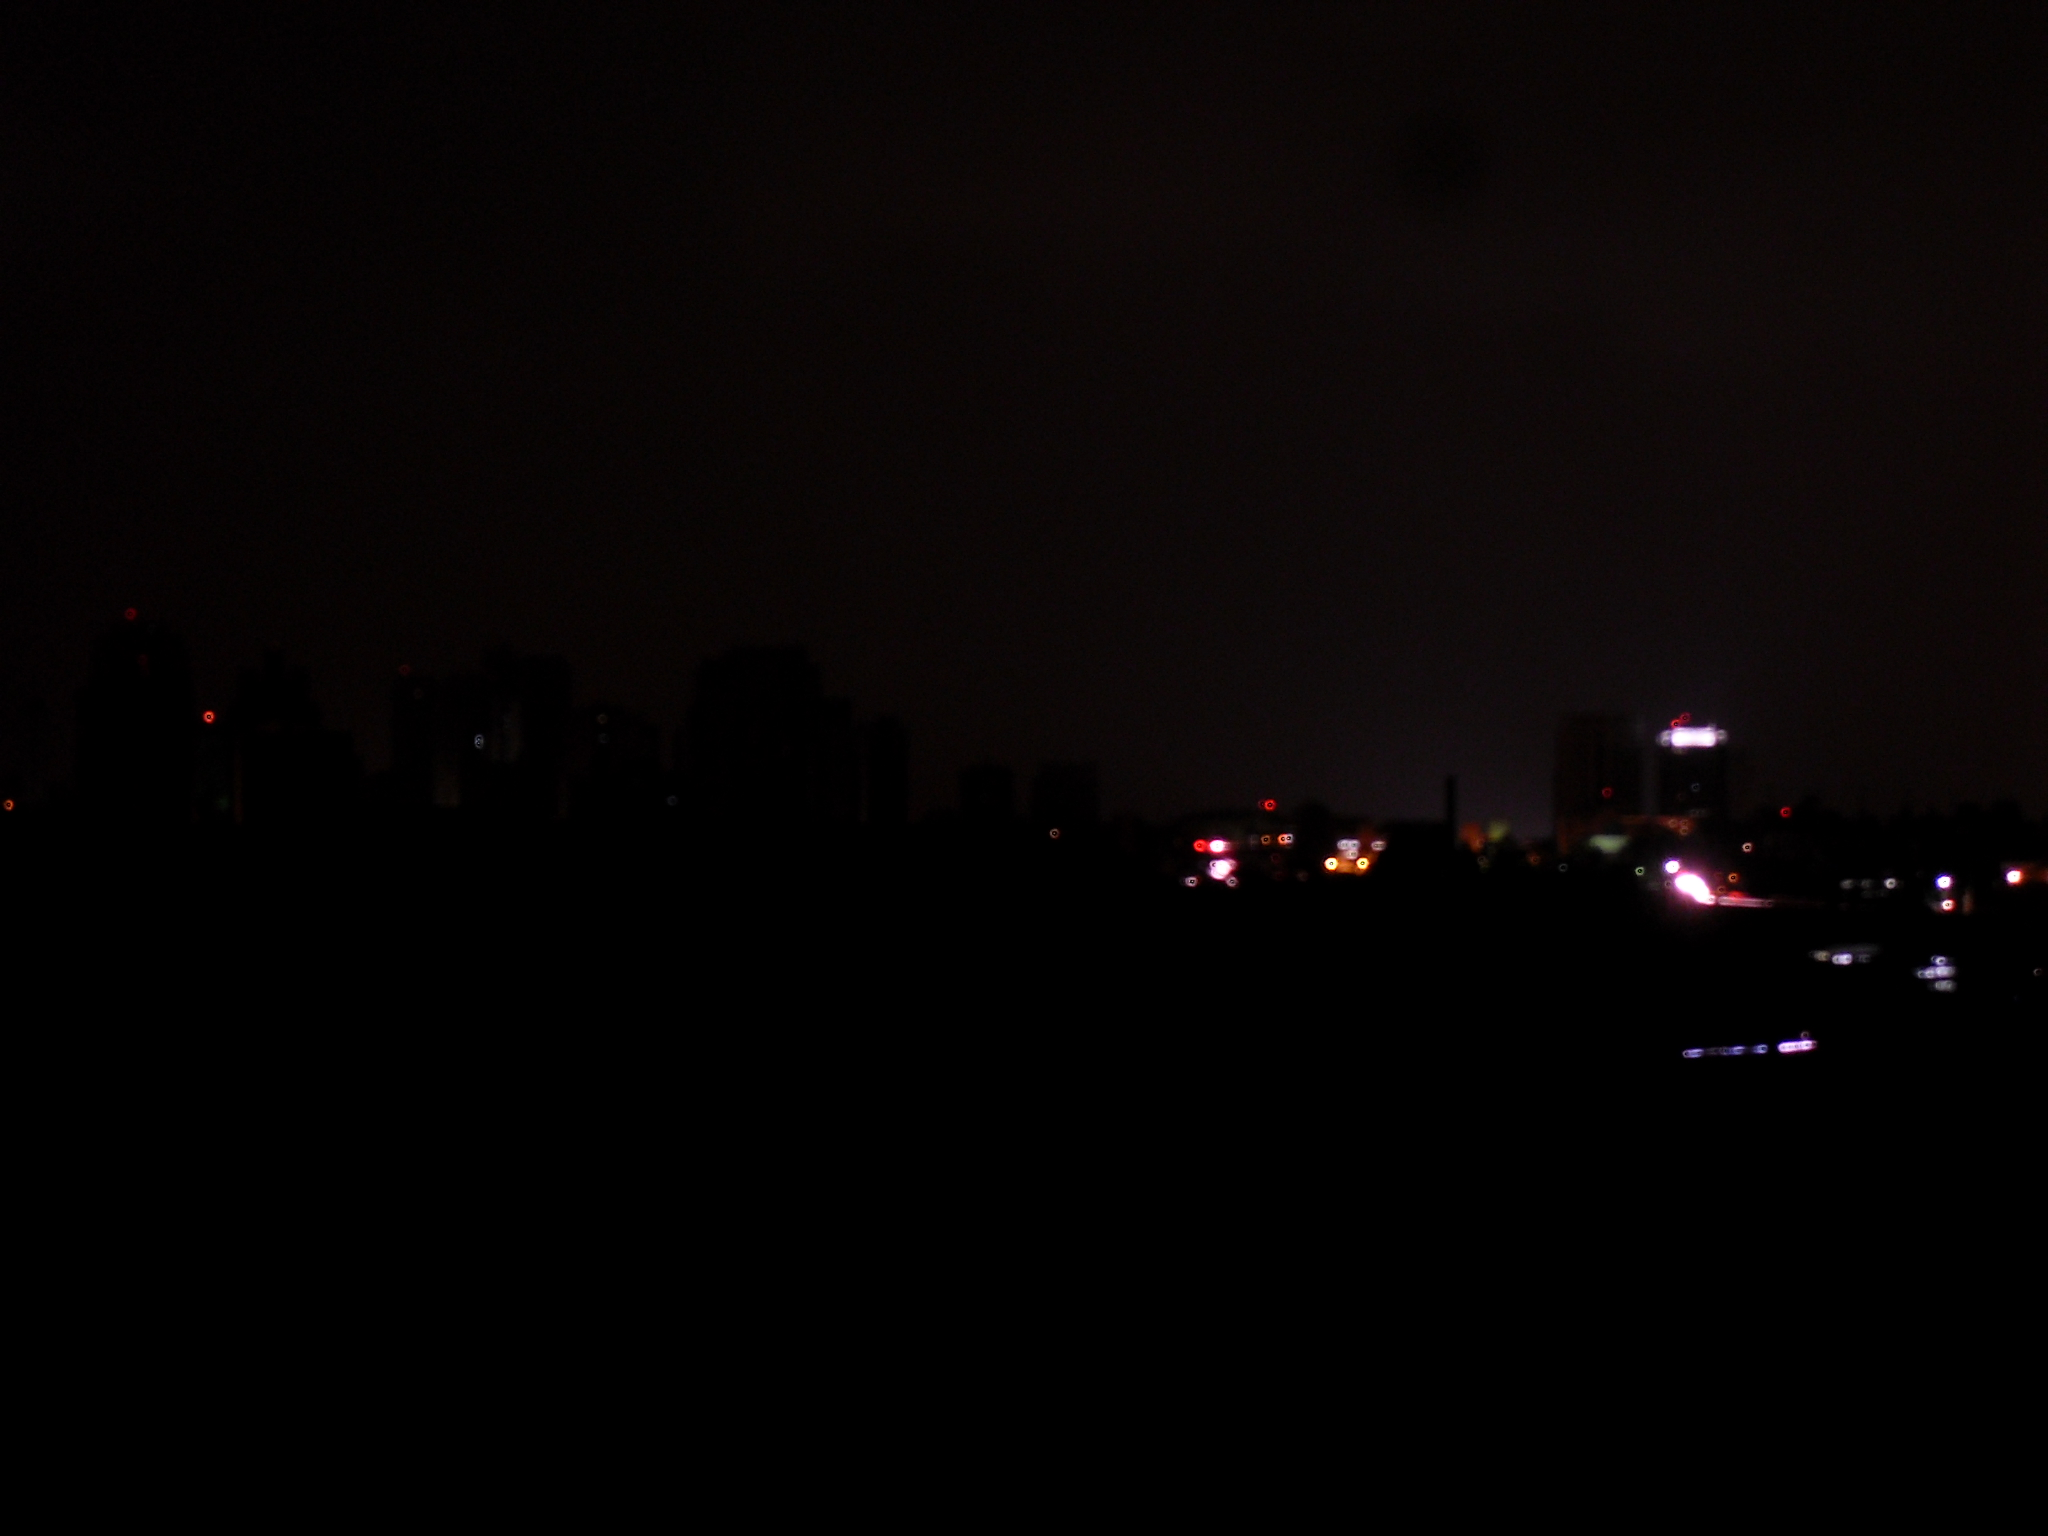 File:Blackout 2009 - panoramio (2).jpg - Wikimedia Commons